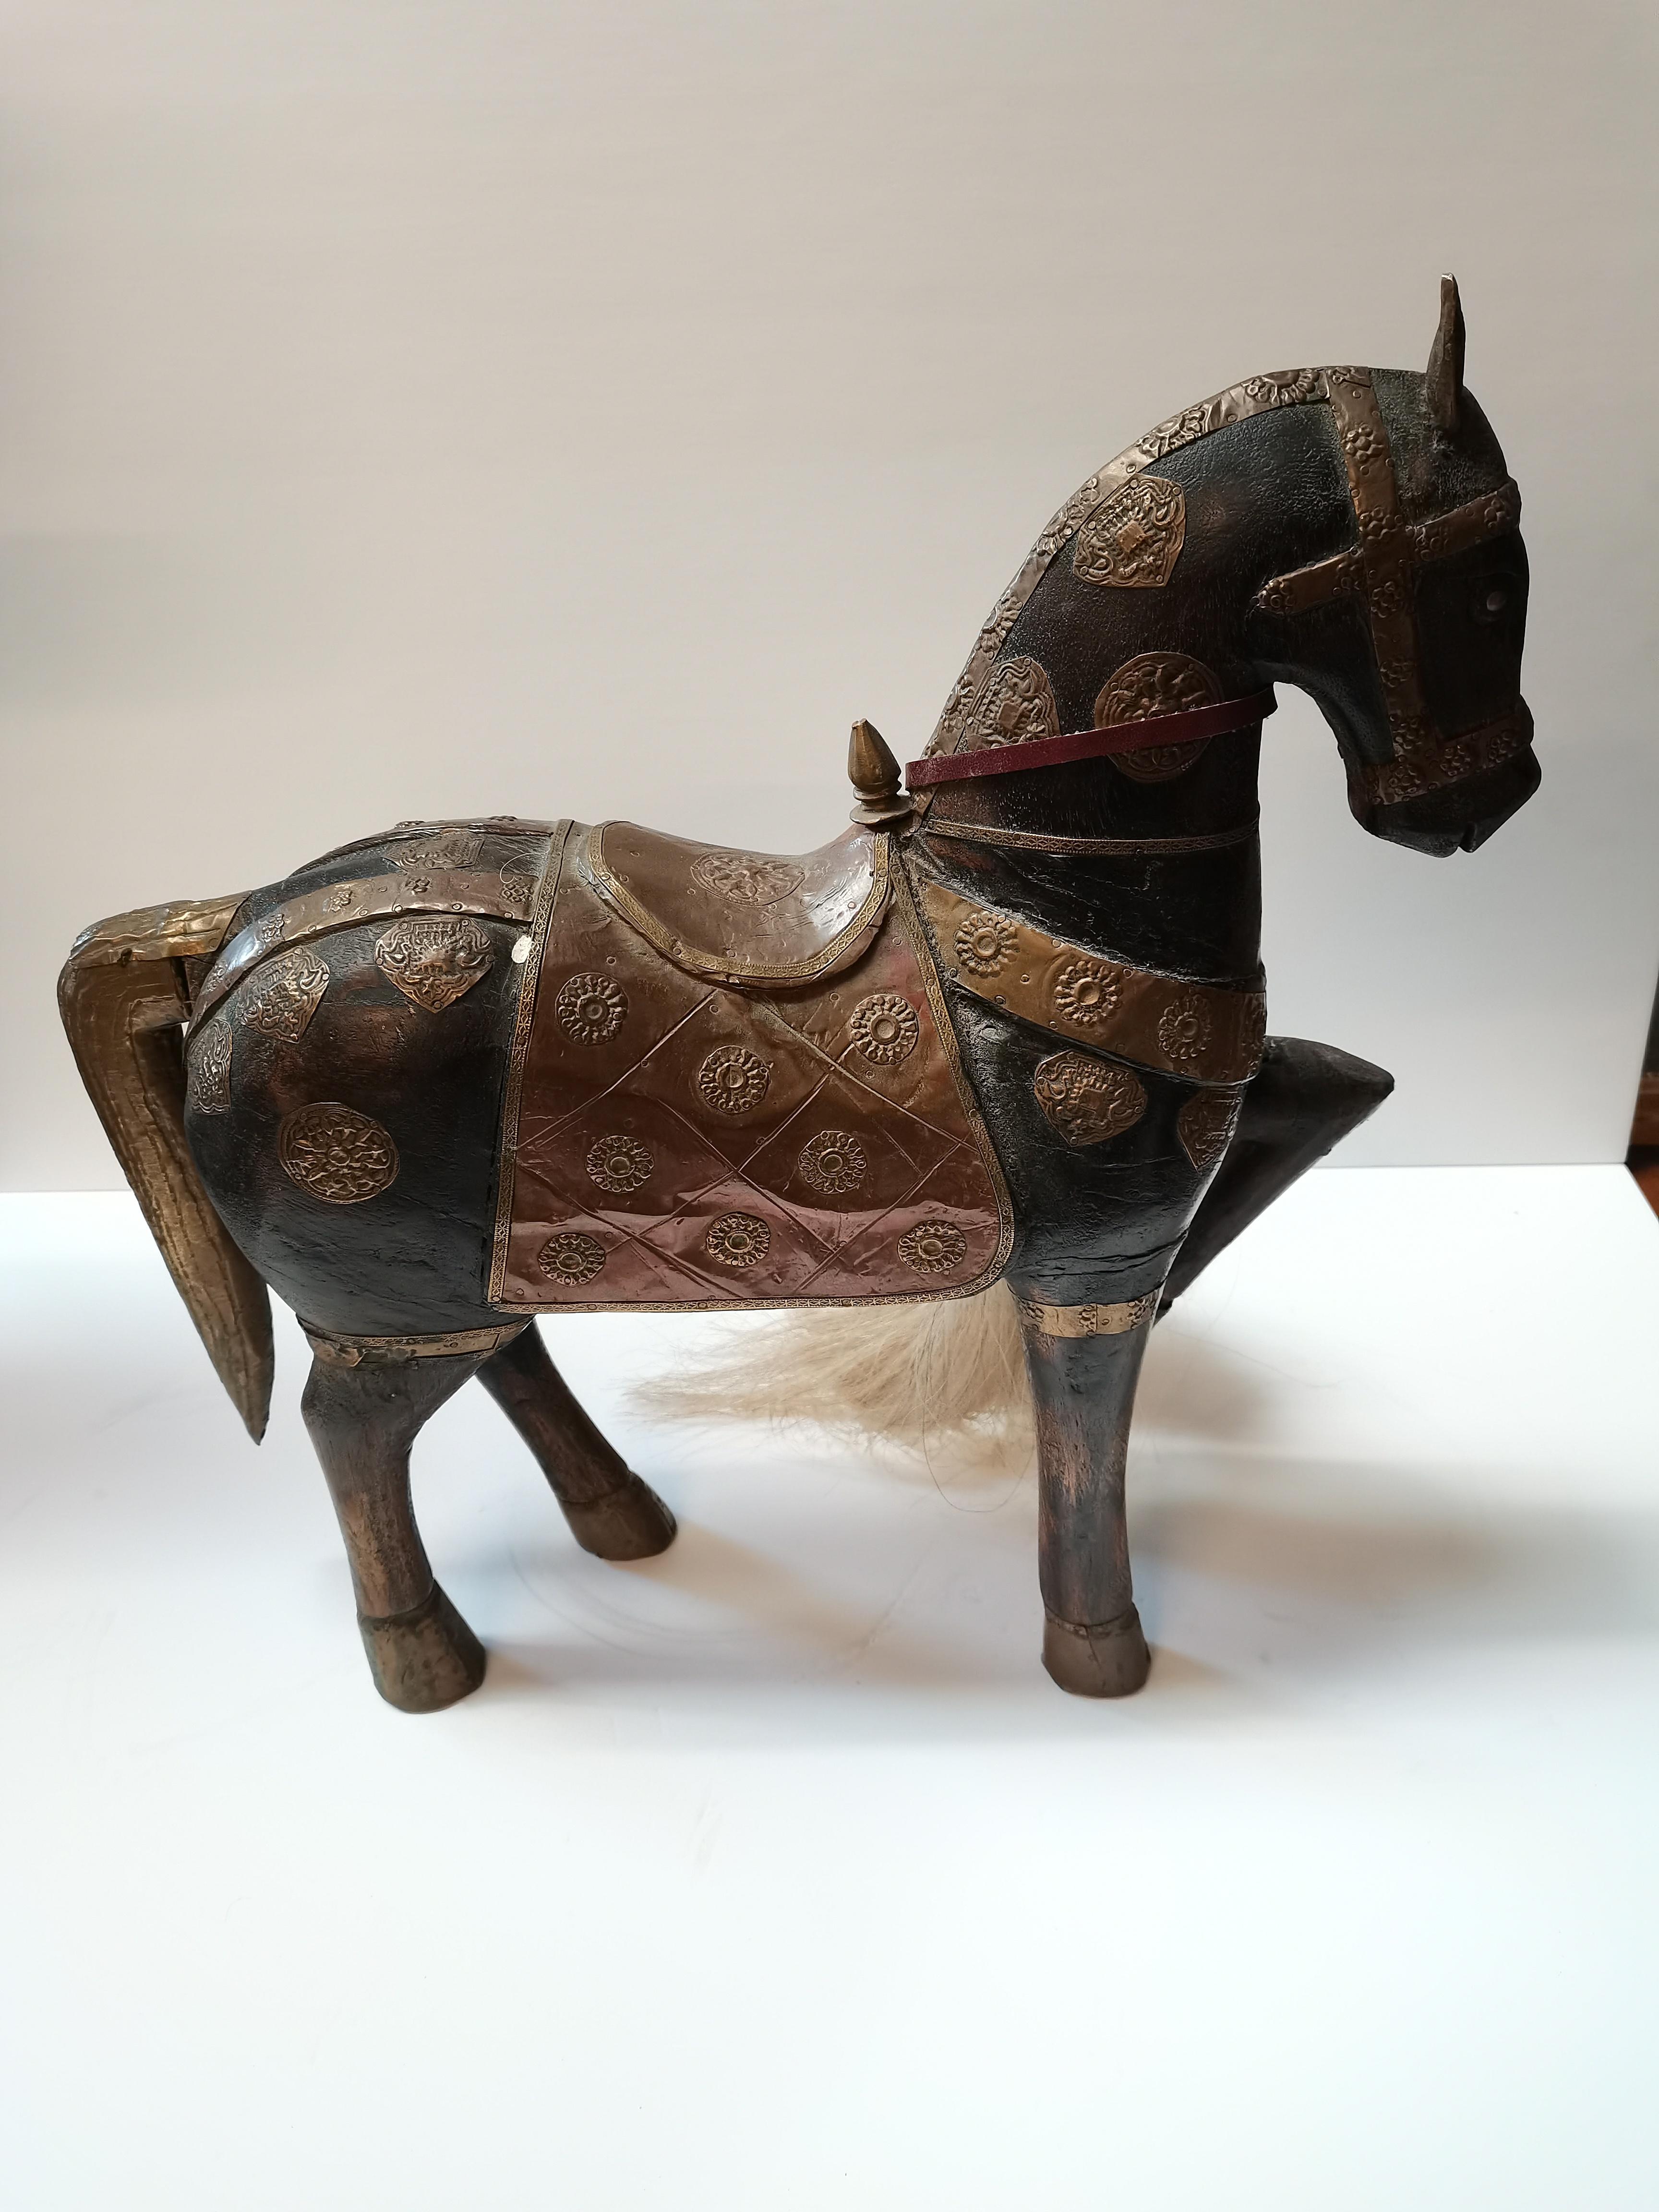 Eygptian style horse figure - Image 4 of 4